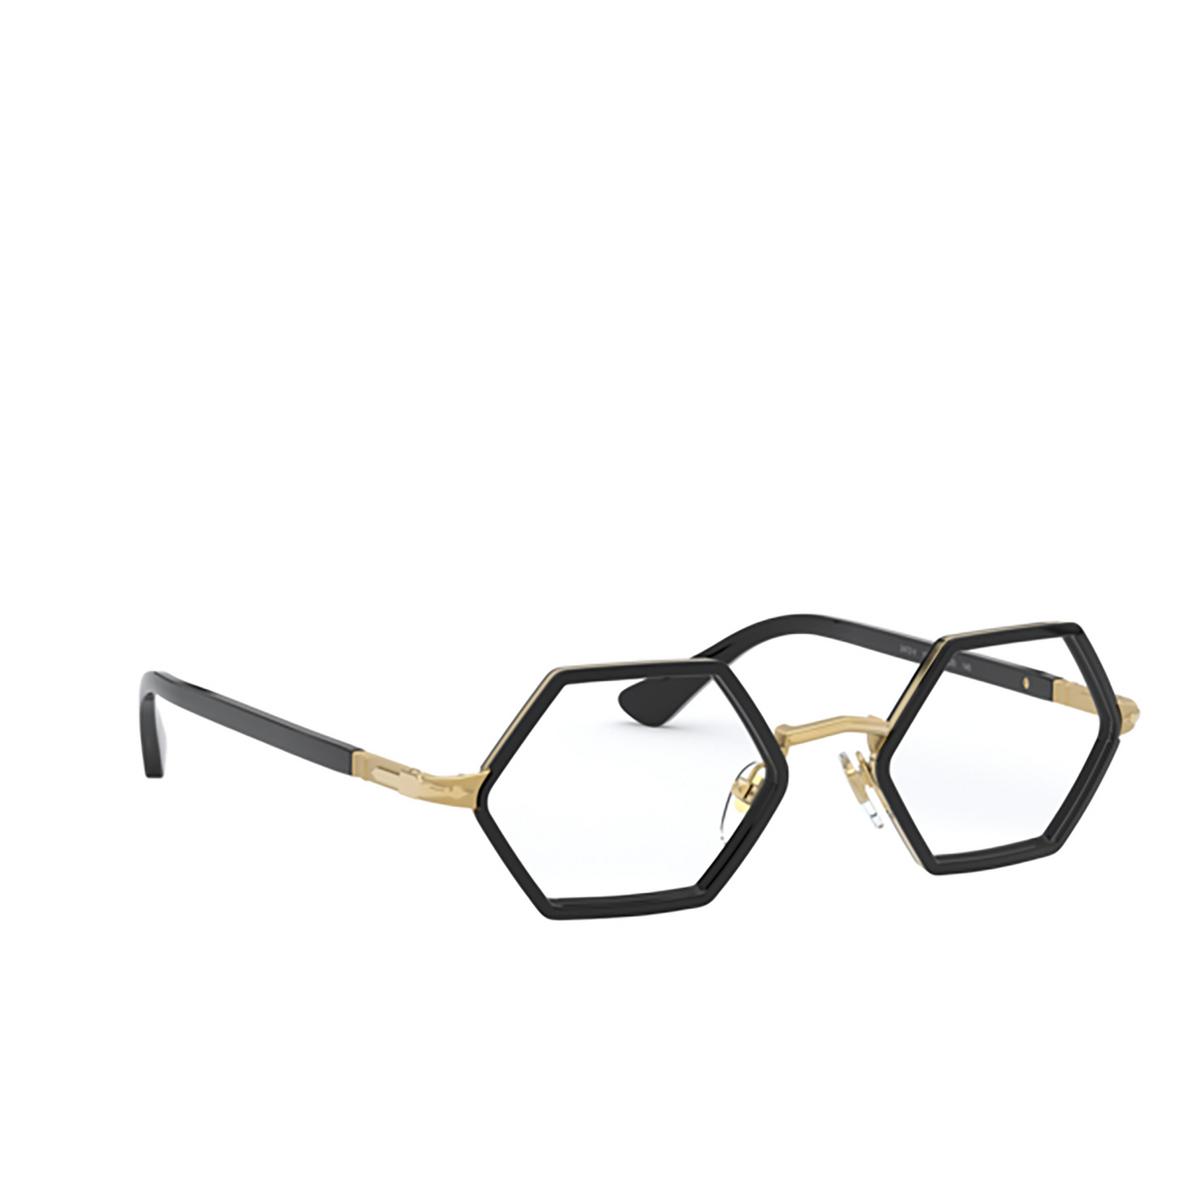 Persol® Irregular Eyeglasses: PO2472V color Gold & Black 1097 - three-quarters view.